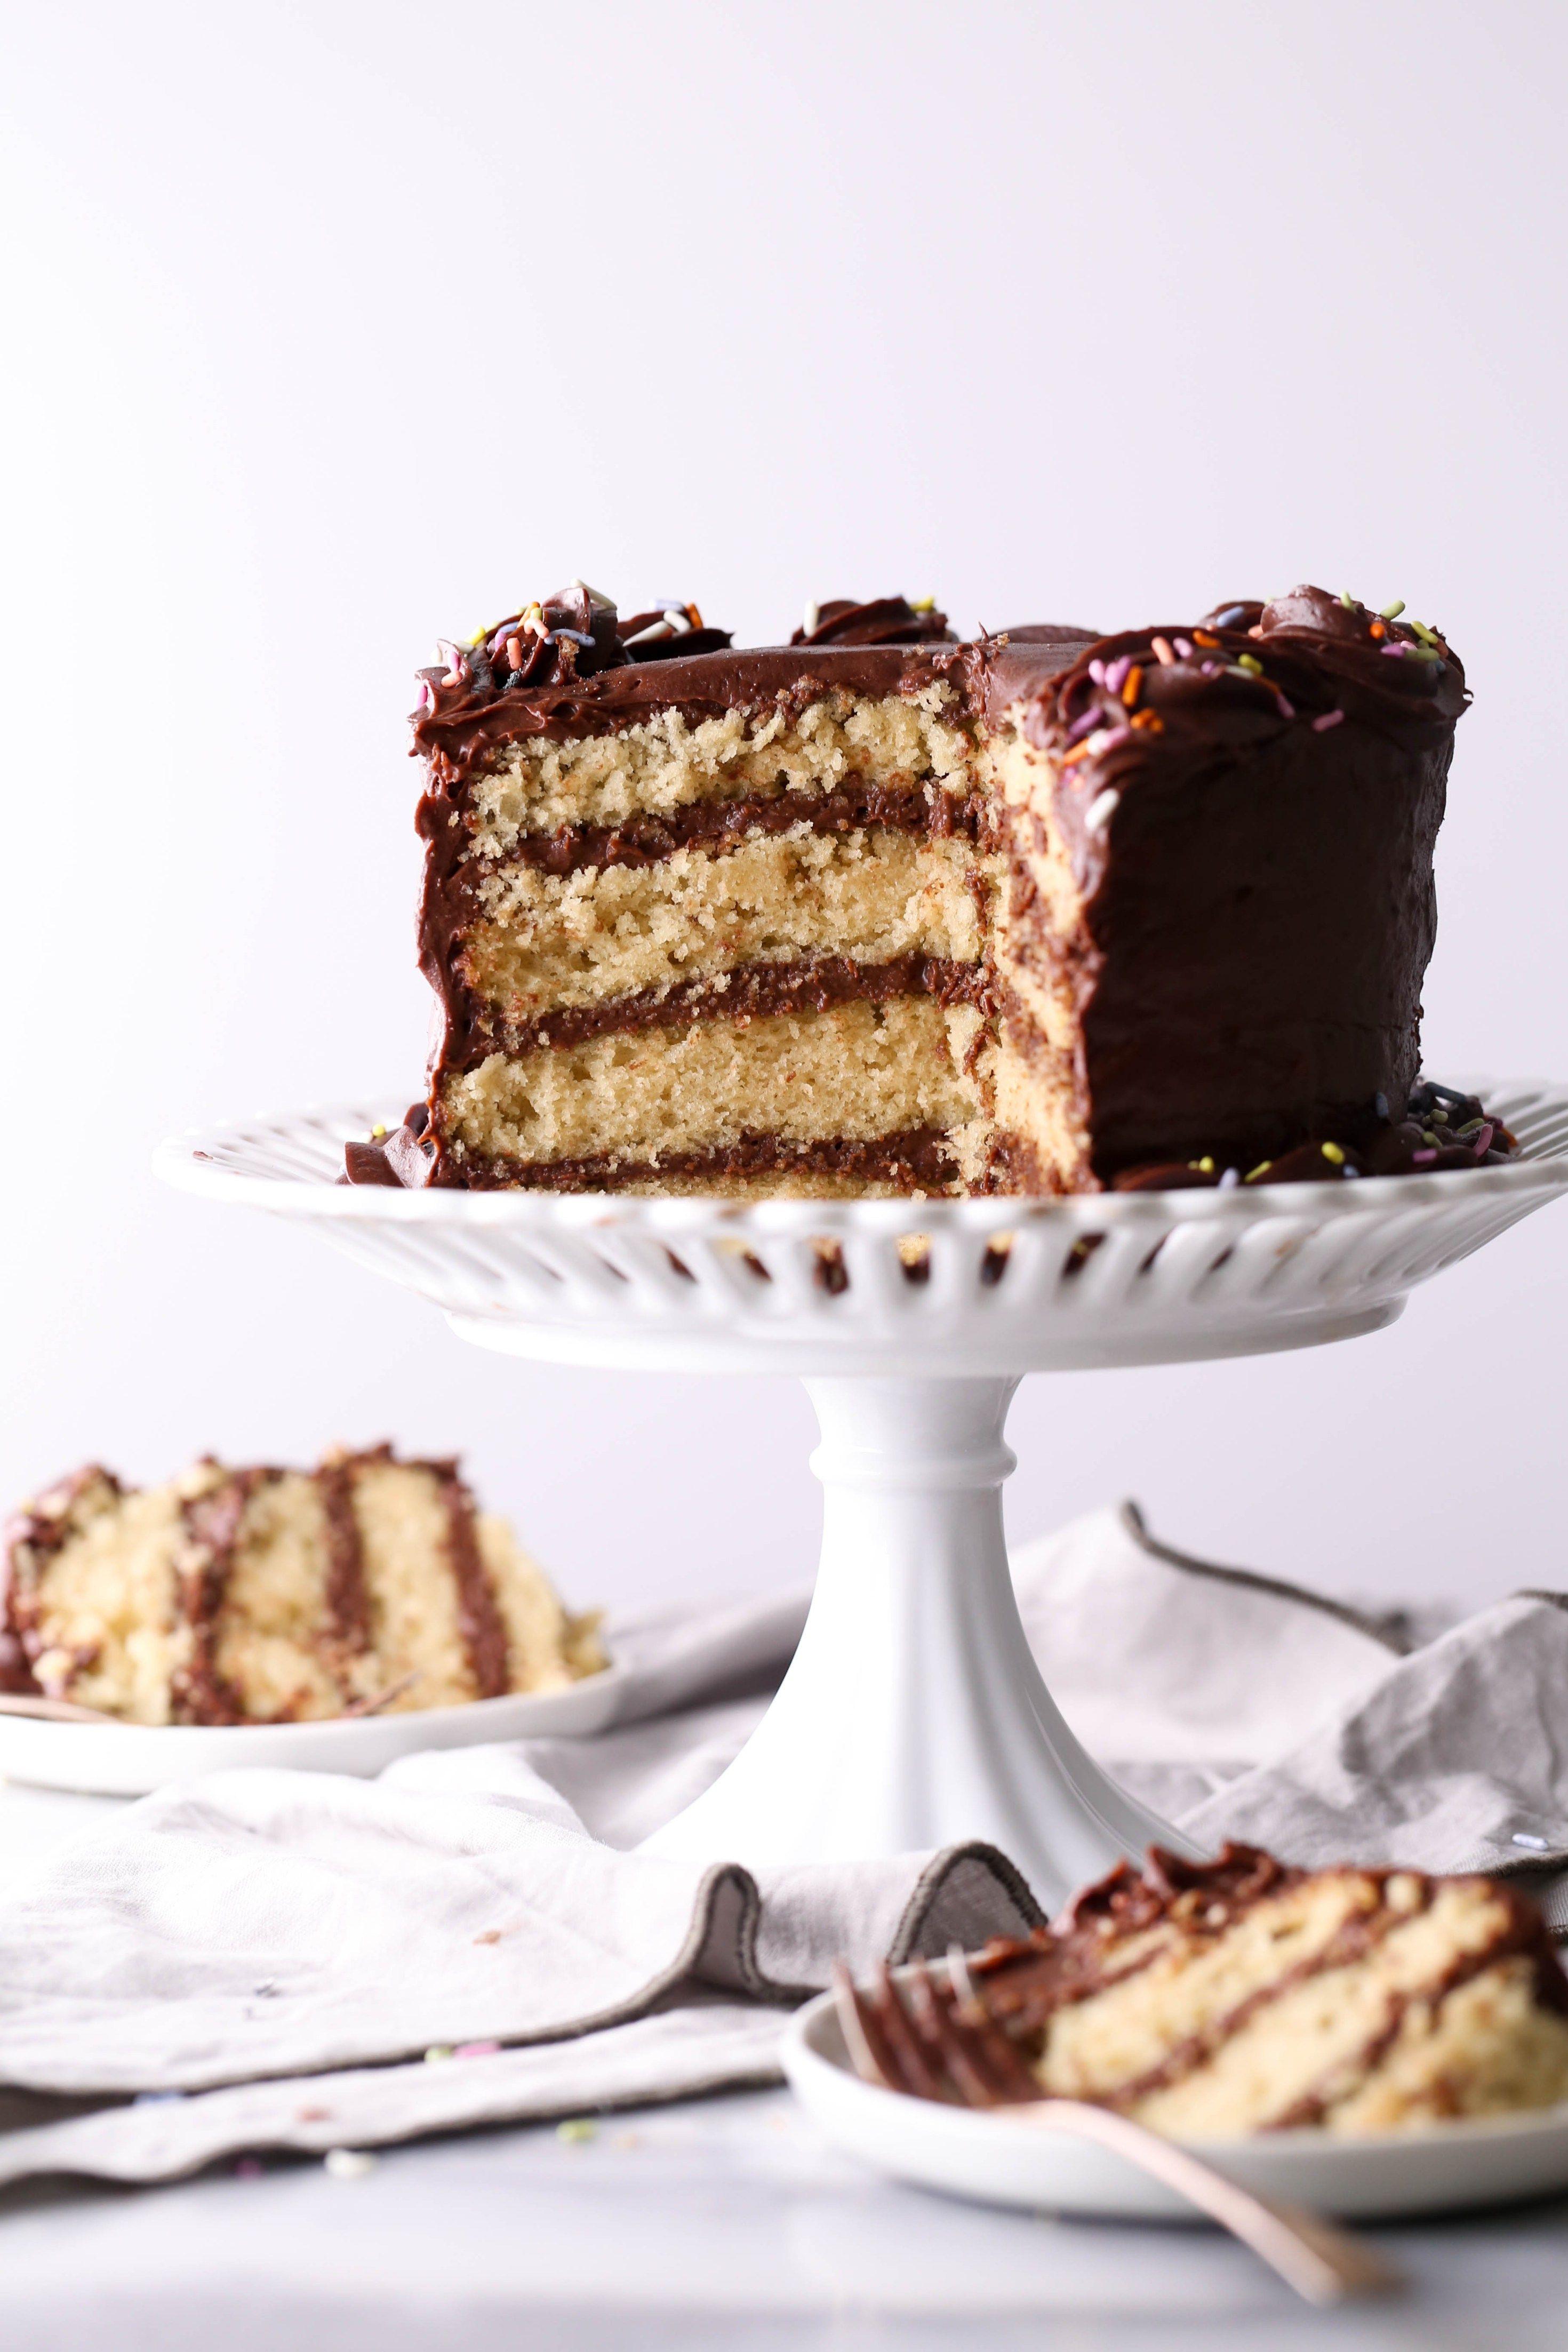 Vegan Vanilla Cake With Chocolate Frosting Recipe Vegan Vanilla Cake Vanilla Cake Chocolate Frosting